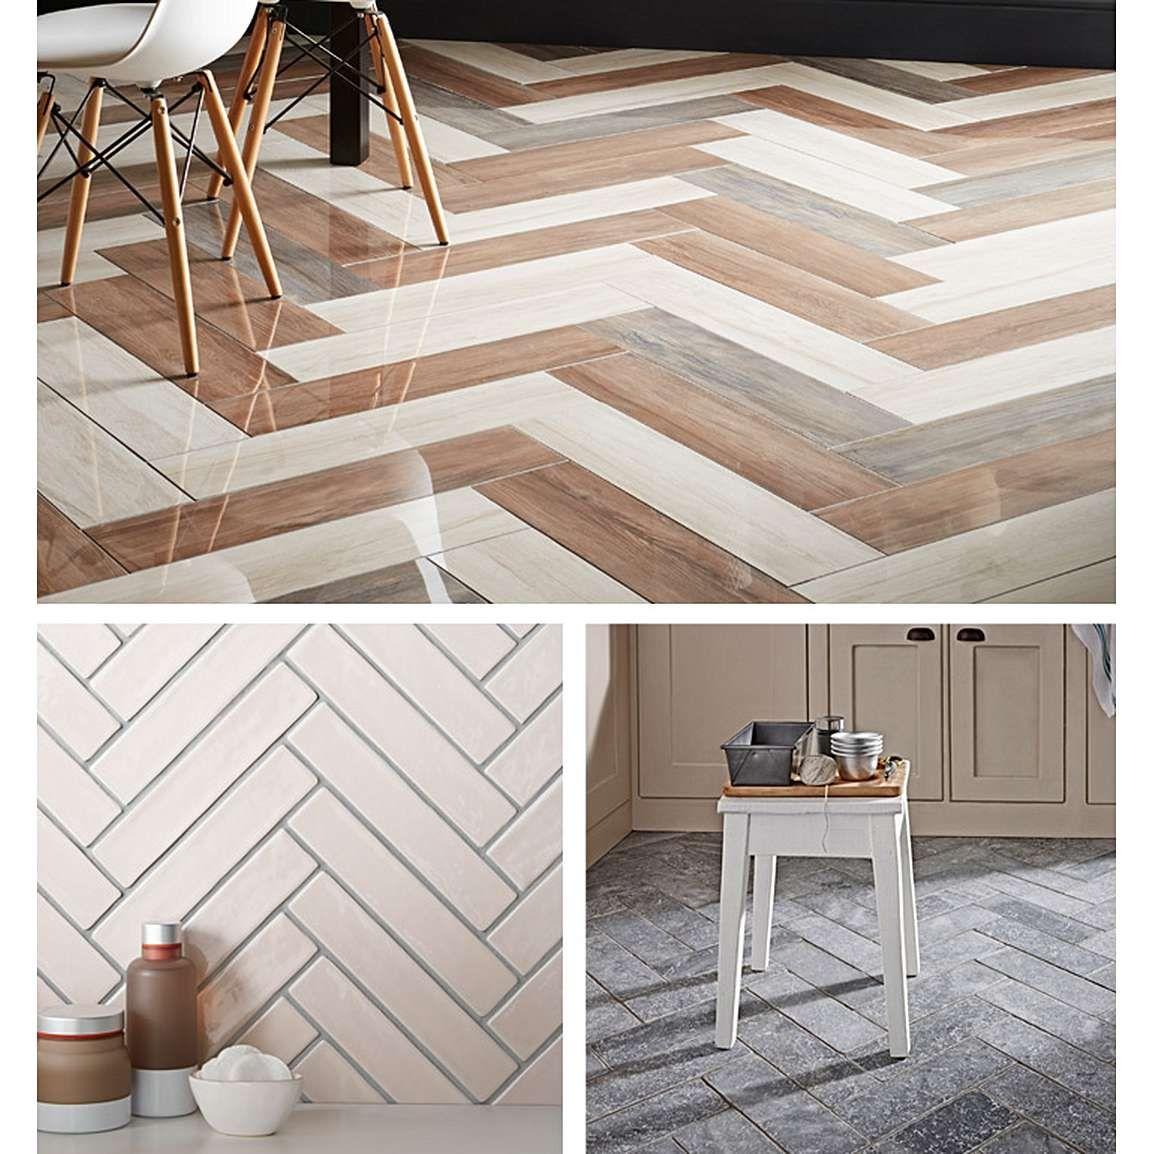 How To Style With Herringbone Tiles in 2020 Herringbone